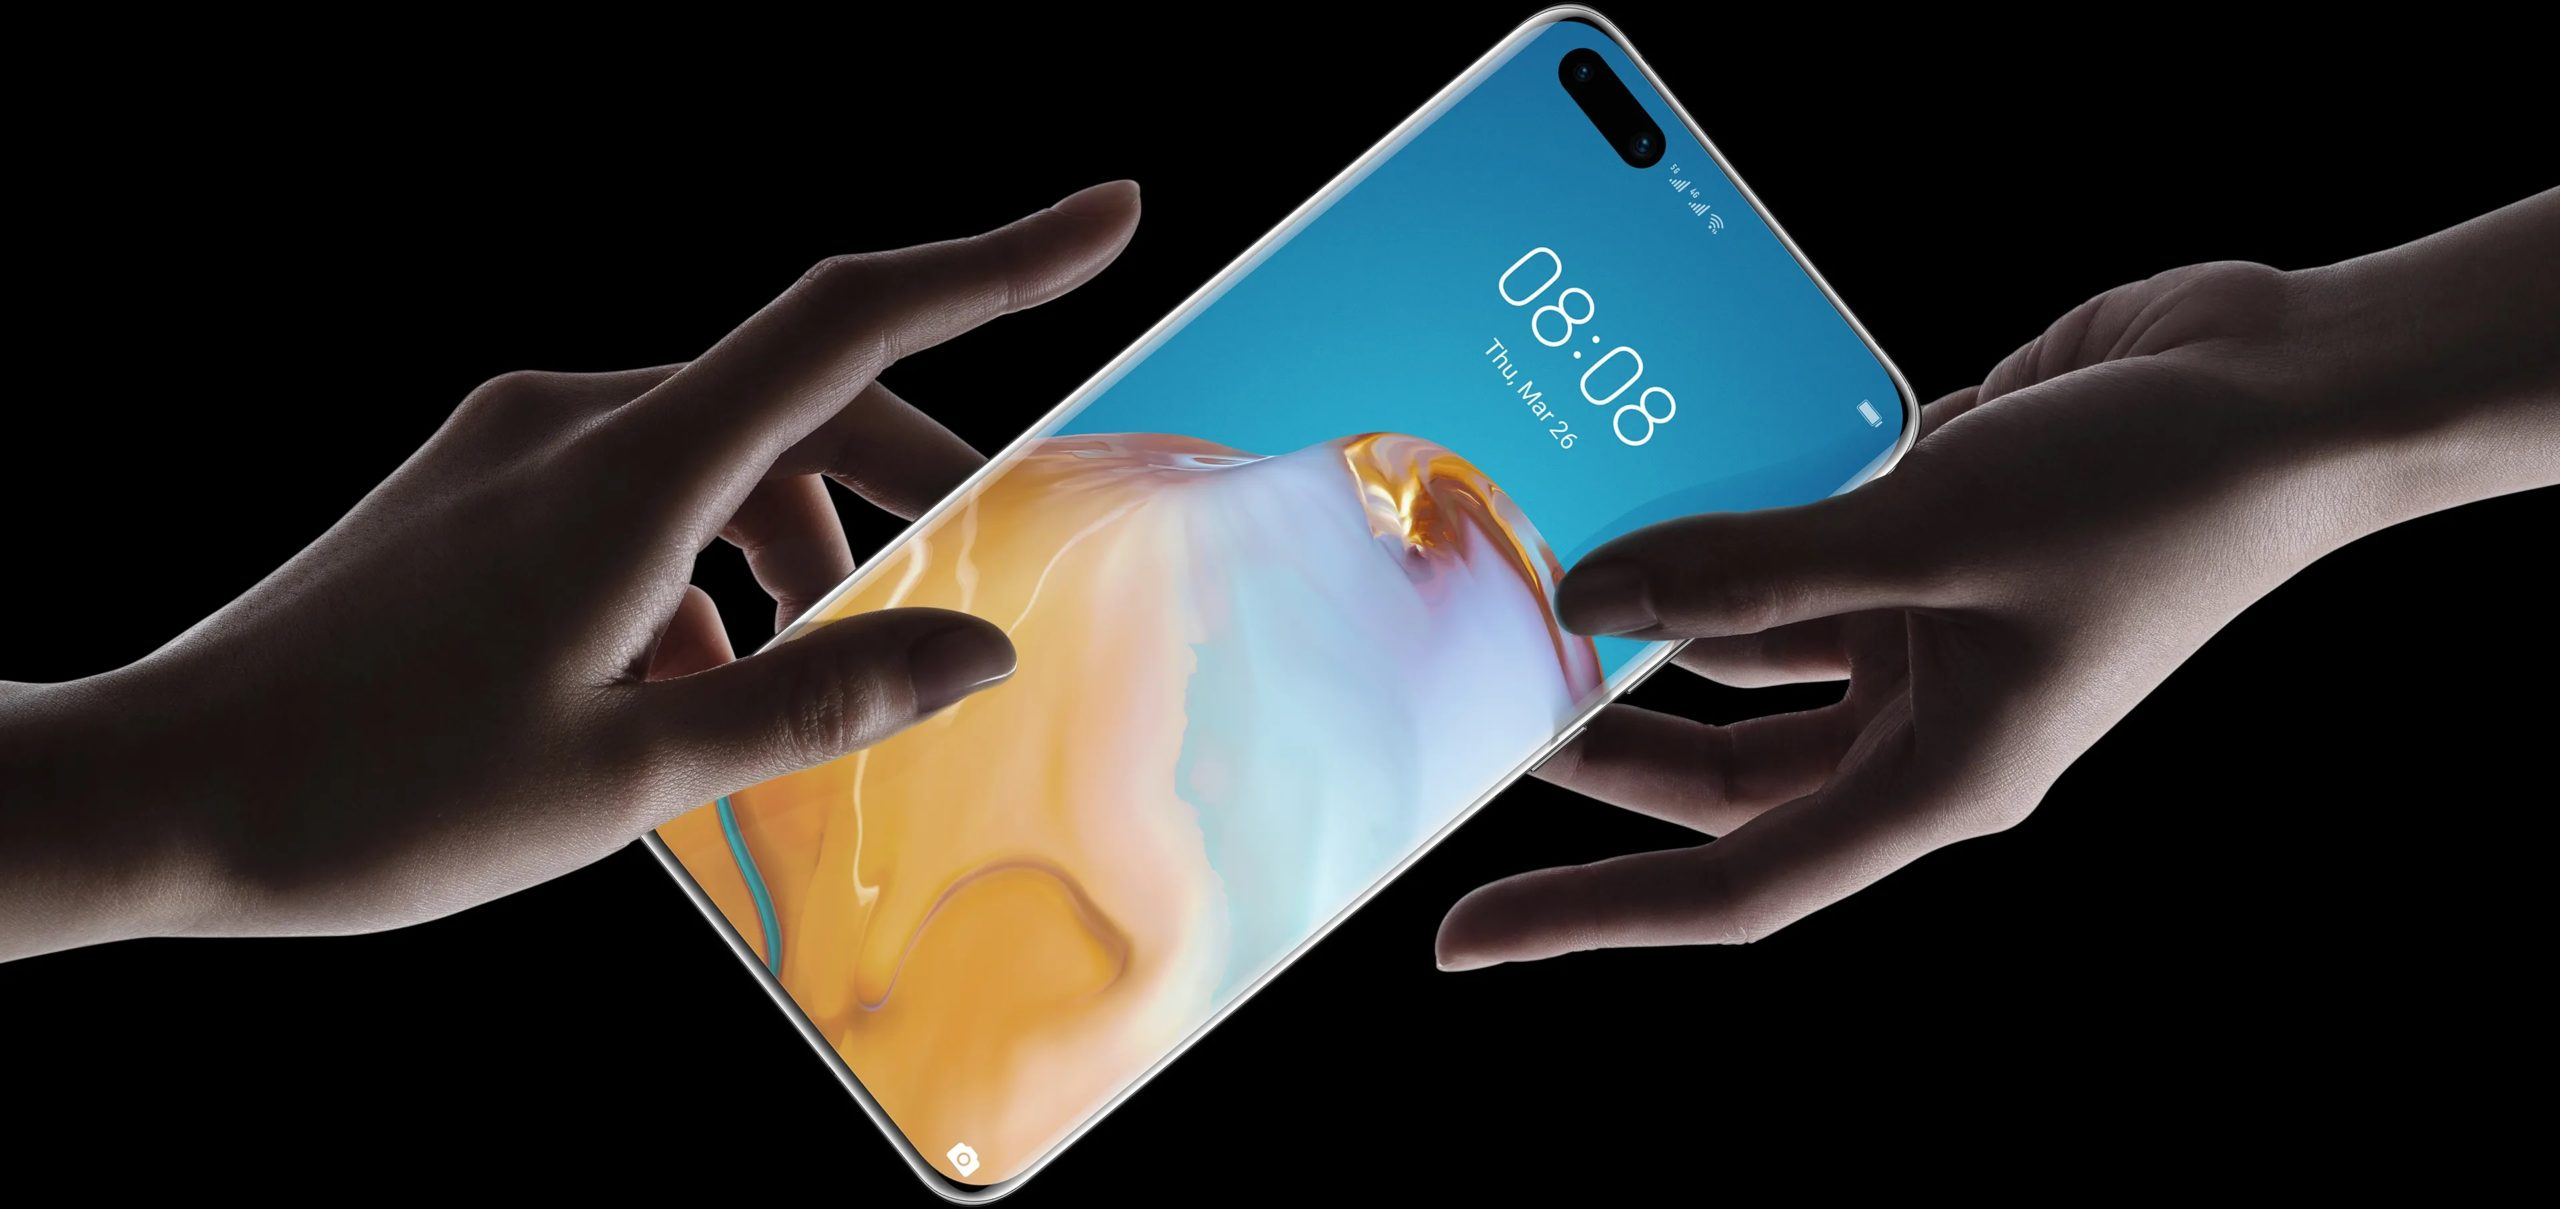 Huawei P40 Pro Plus smartphone